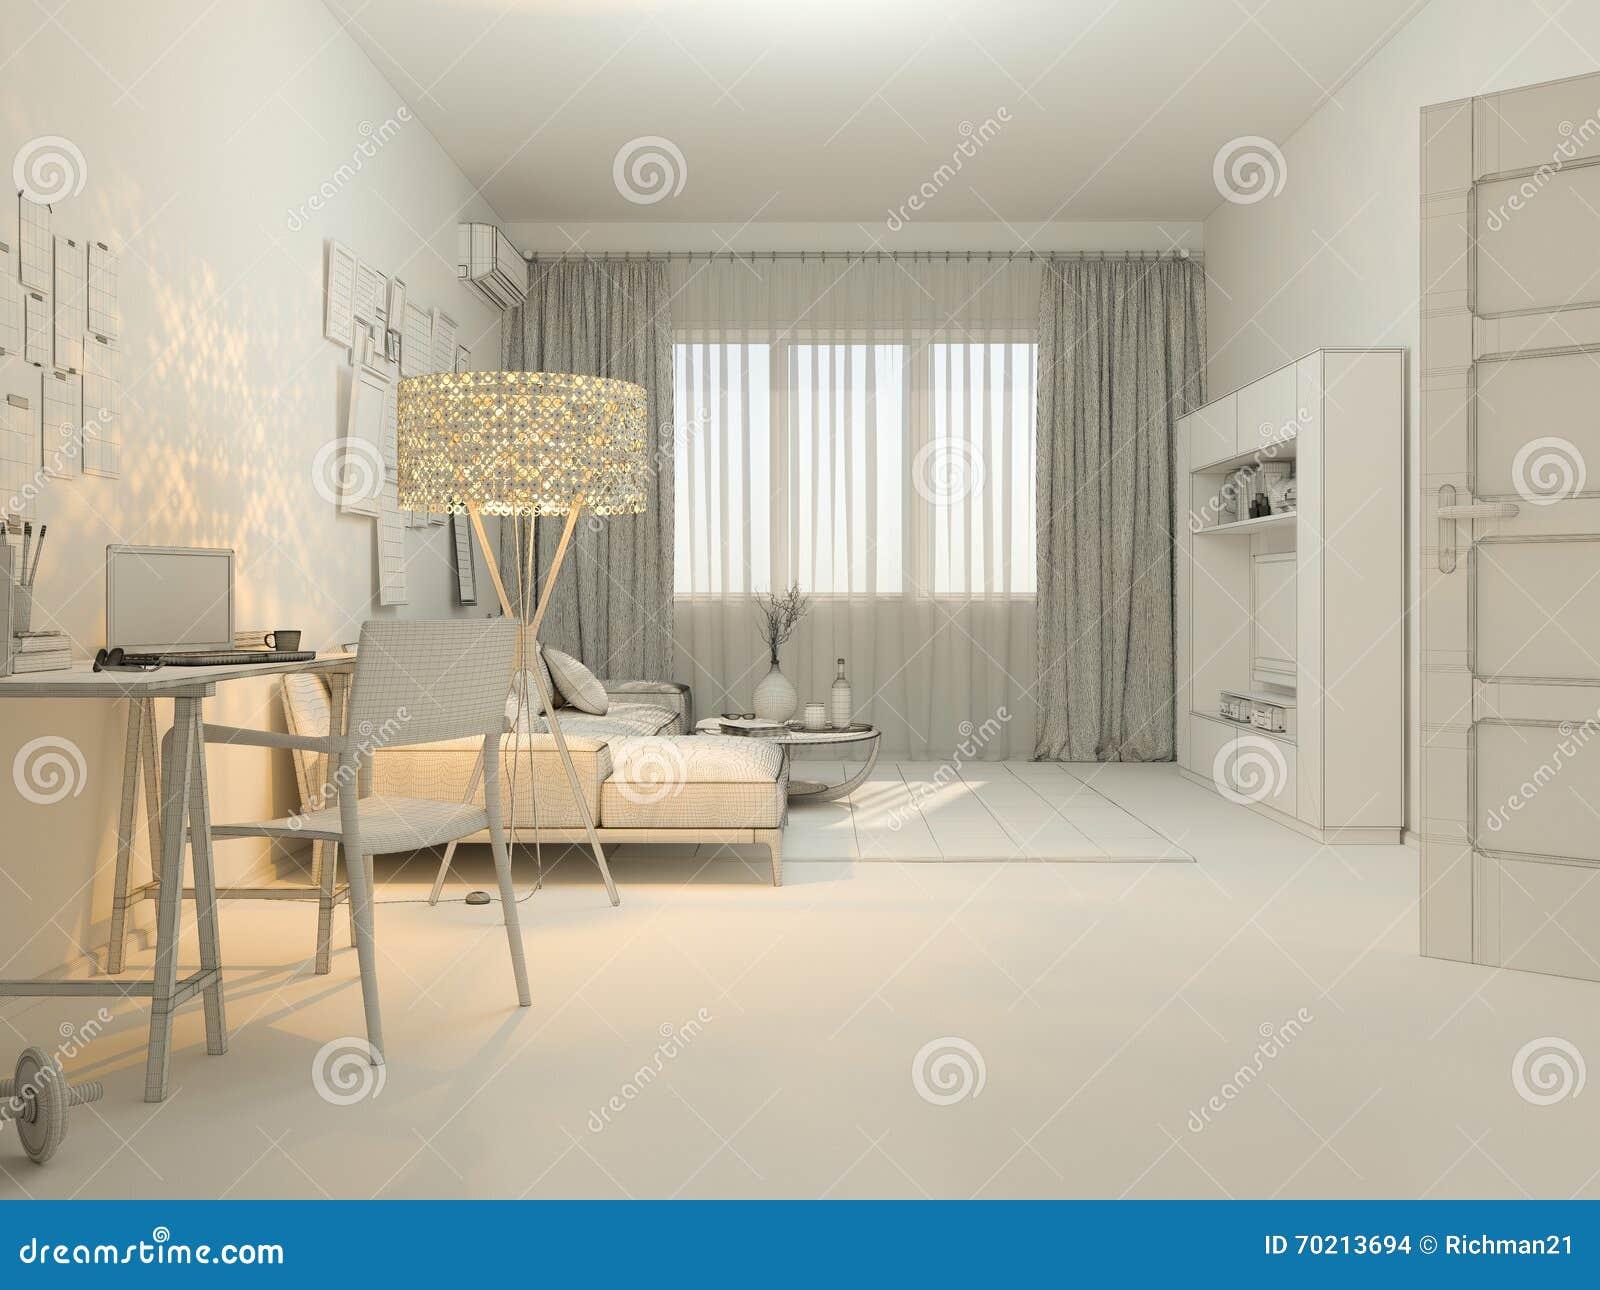 3d visualization of interior design living in a studio for Minimalist studio design